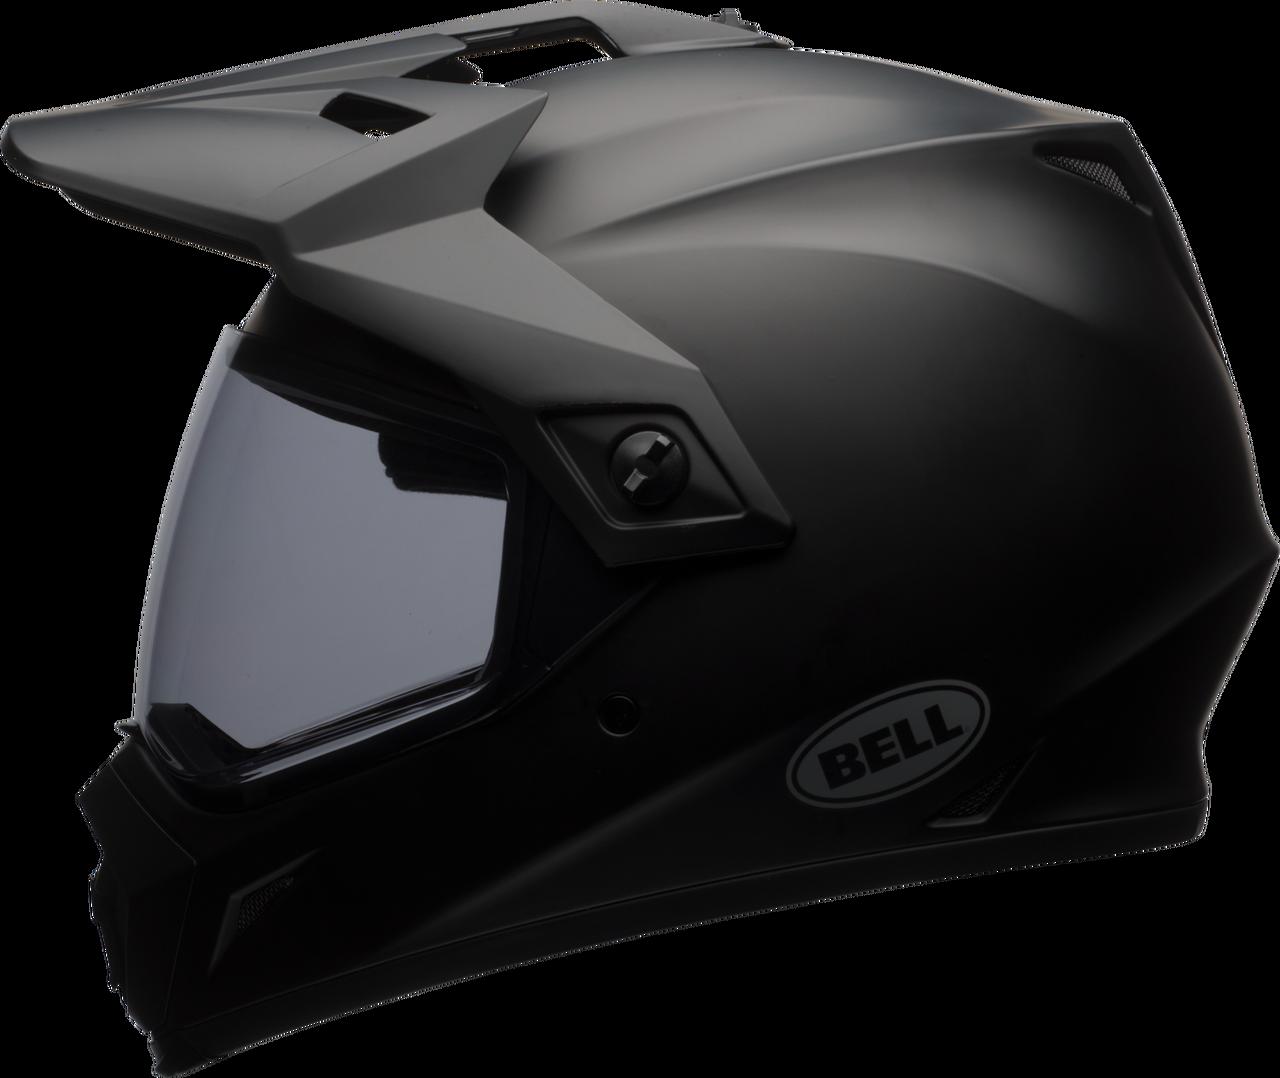 Motodak Casque Bell MX-9 Adventure MIPS Matte Black Taille s